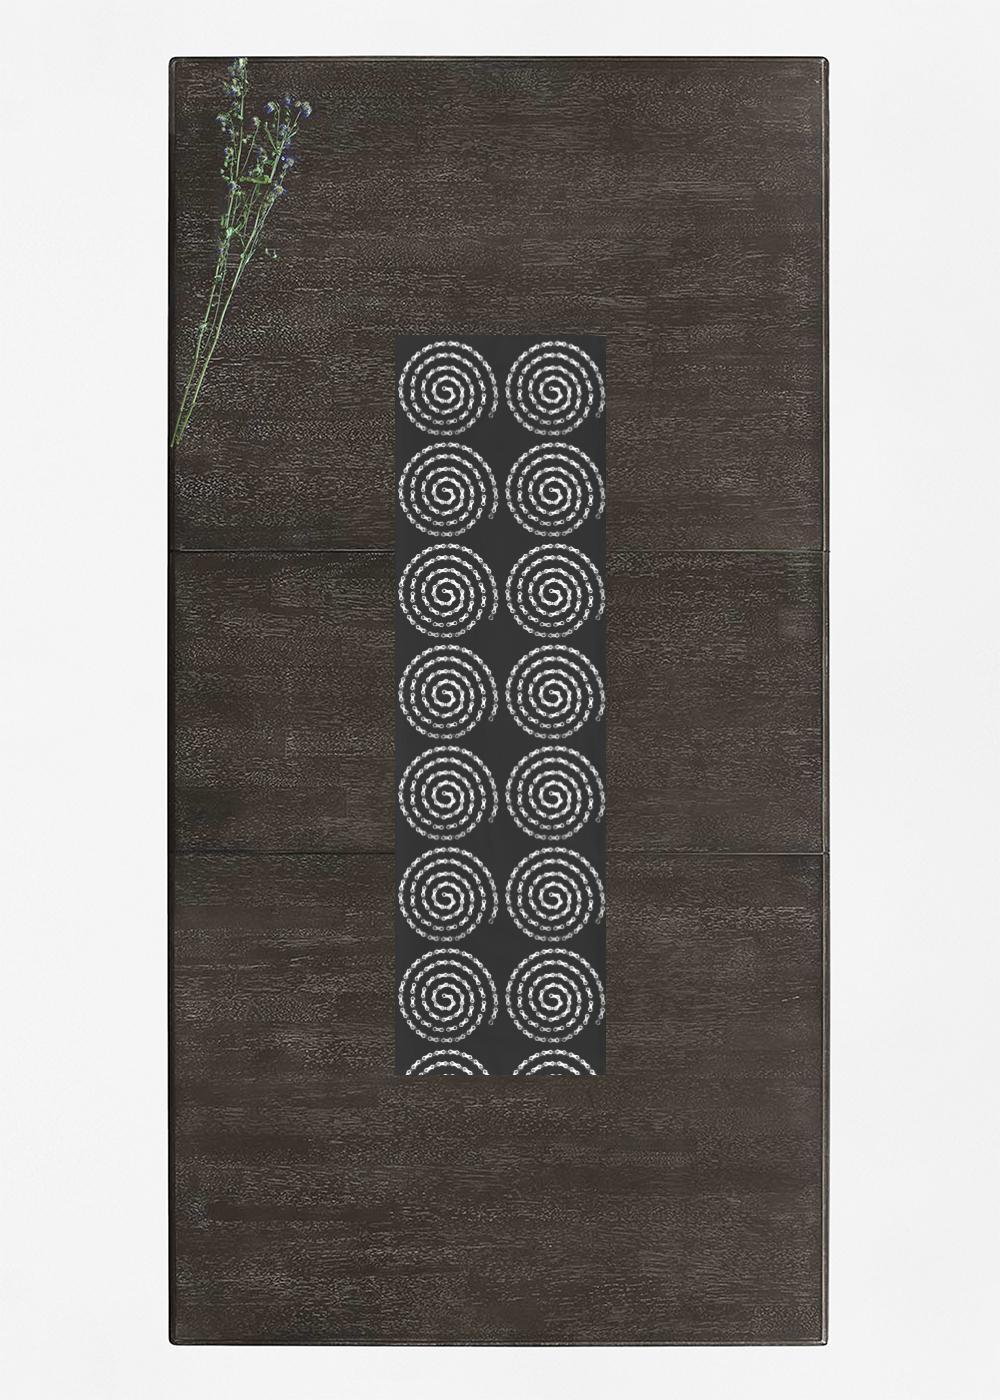 VIDA Table Runner - Bike Chain Spiral by VIDA Original Artist  - Size: Long